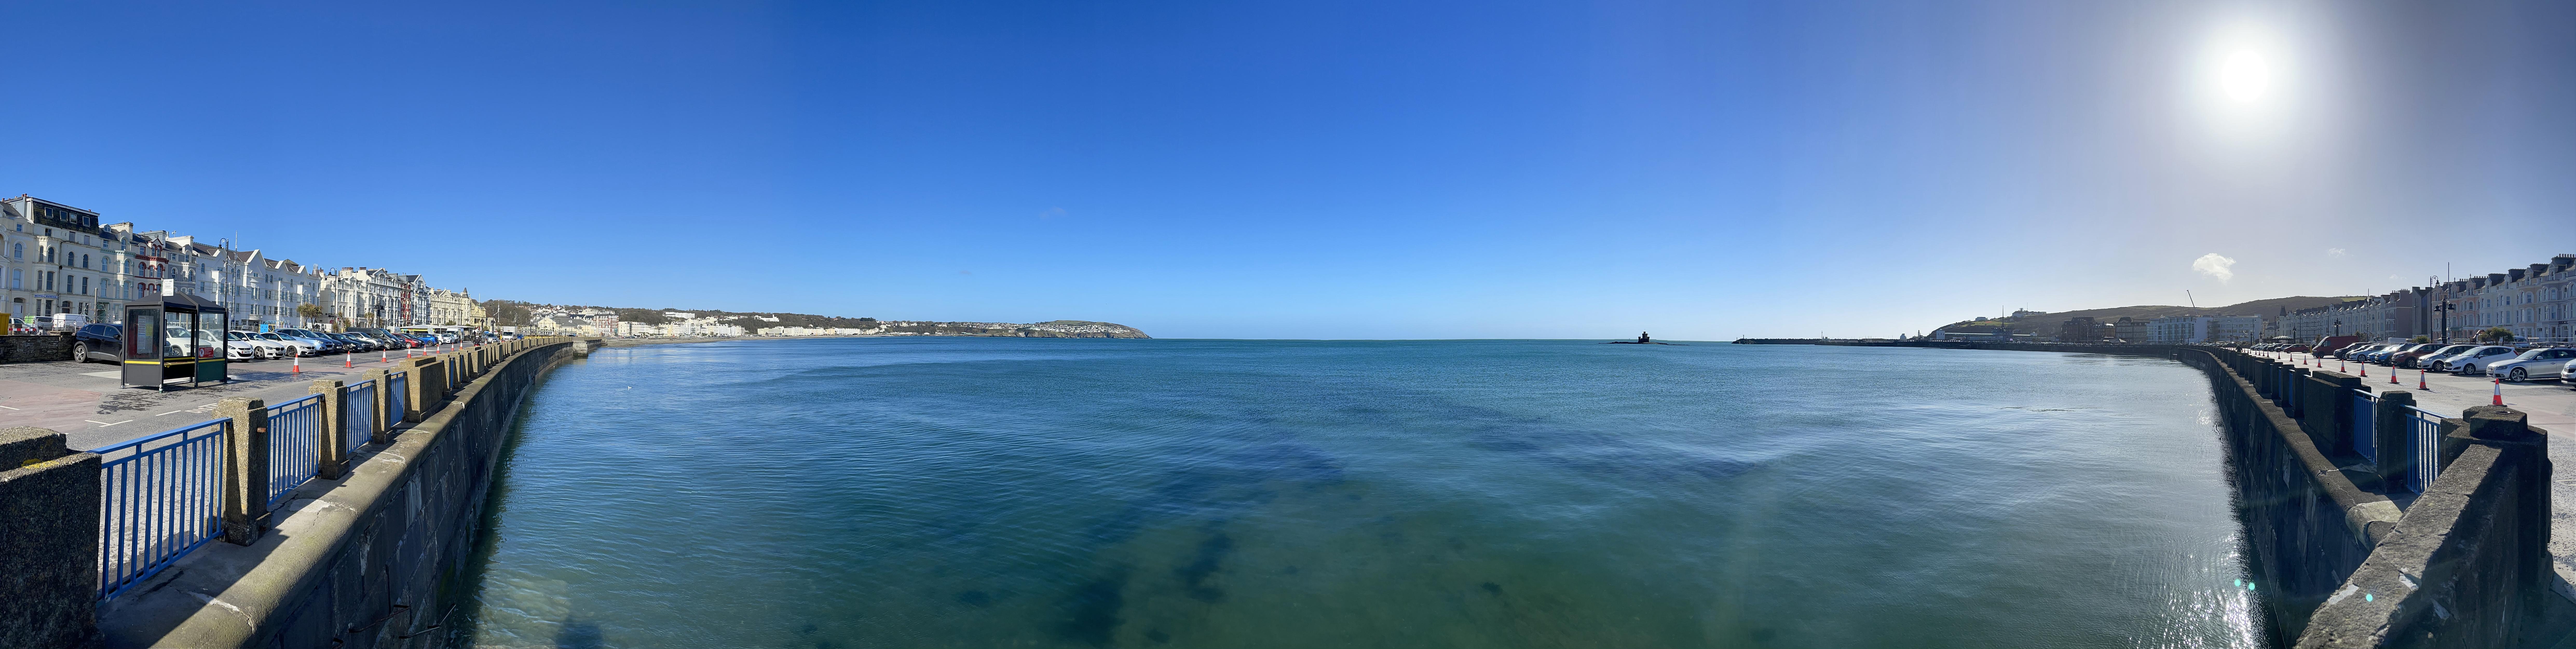 Douglas Promenade Bay